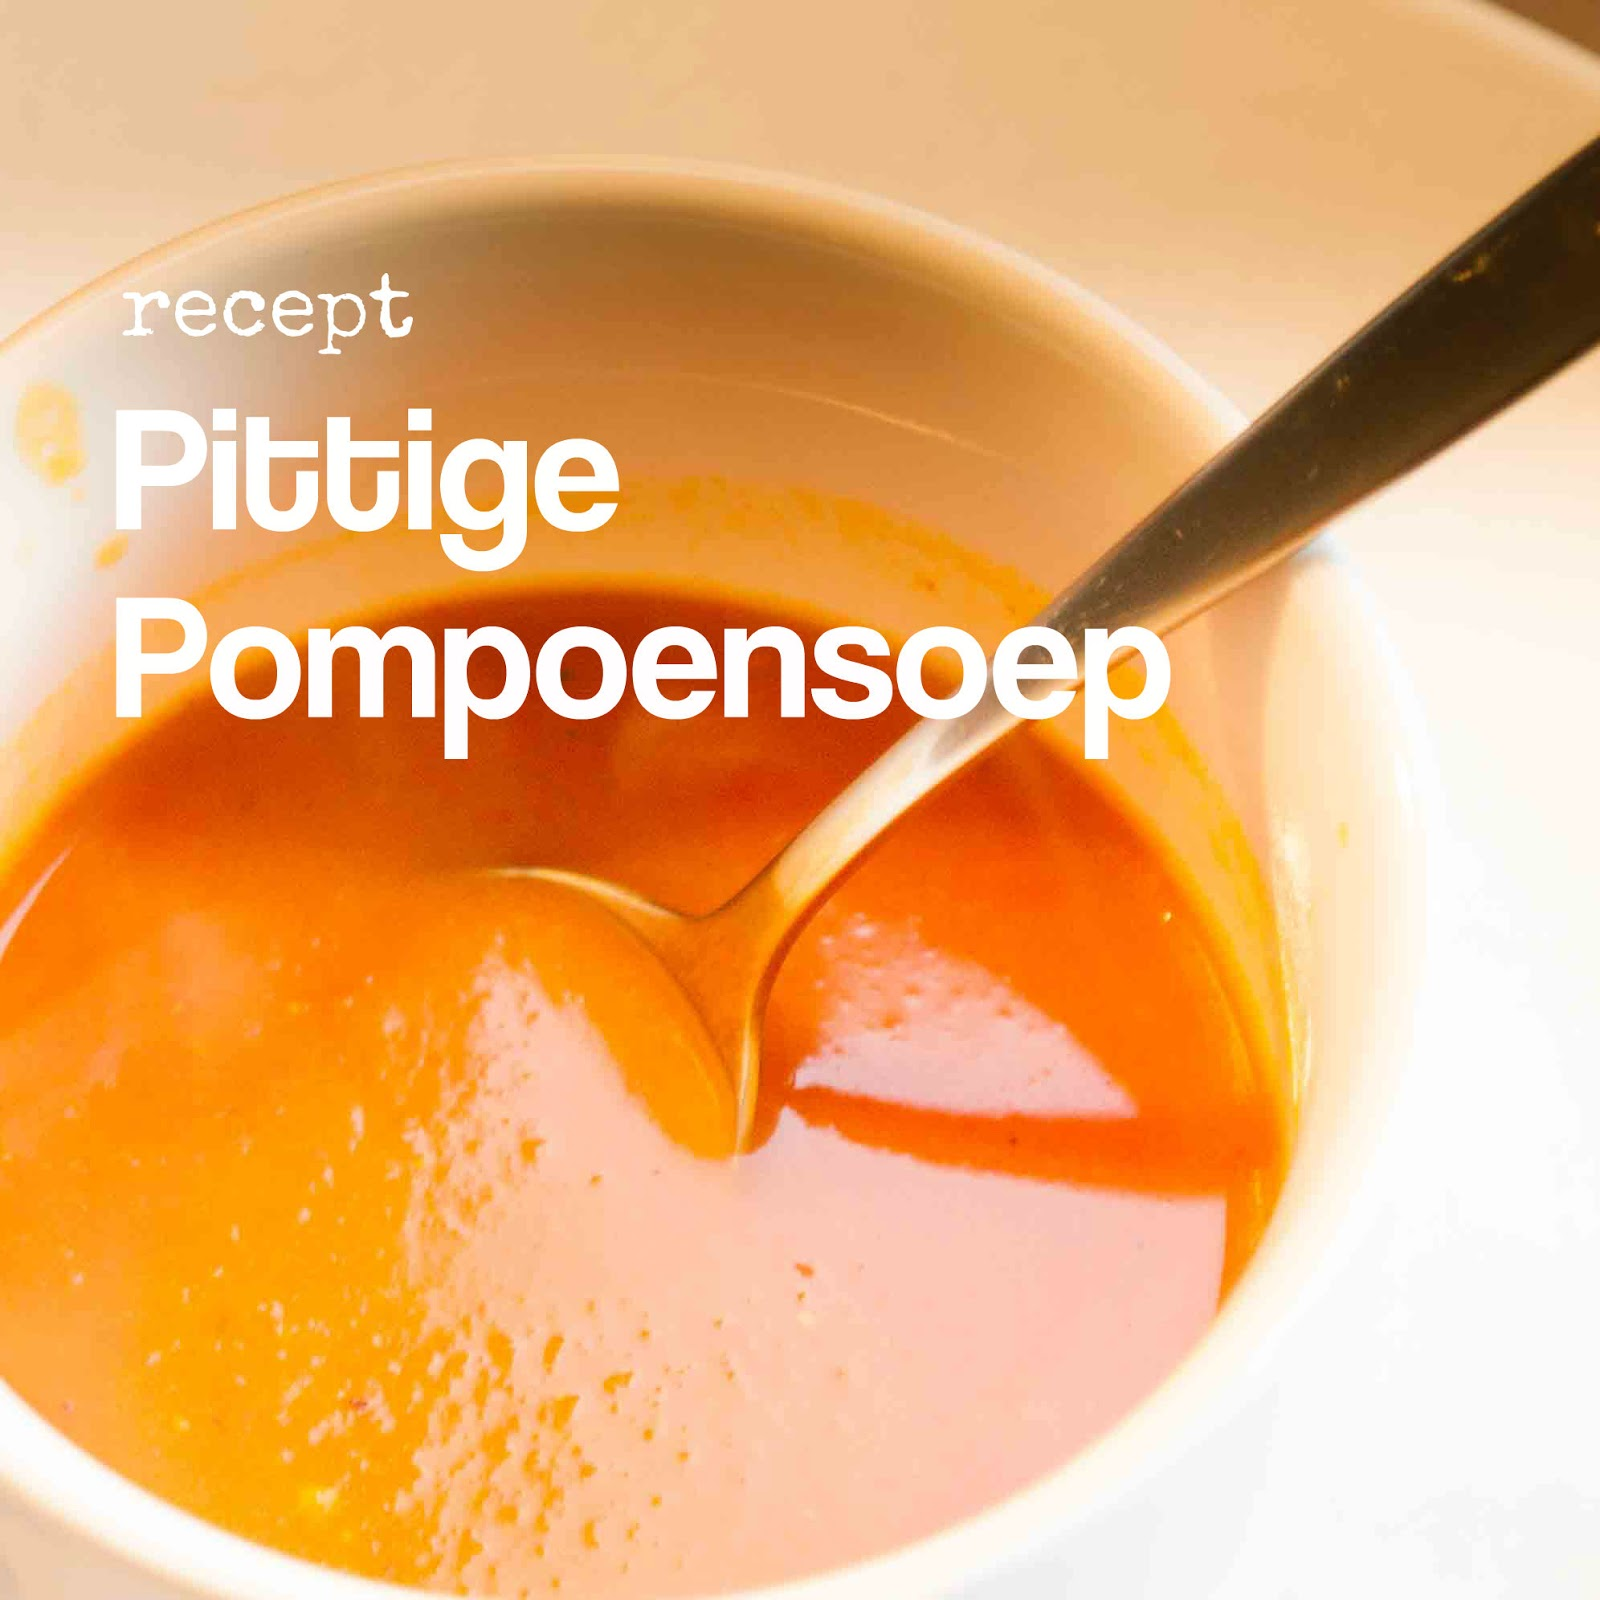 pittige pompoensoep recept